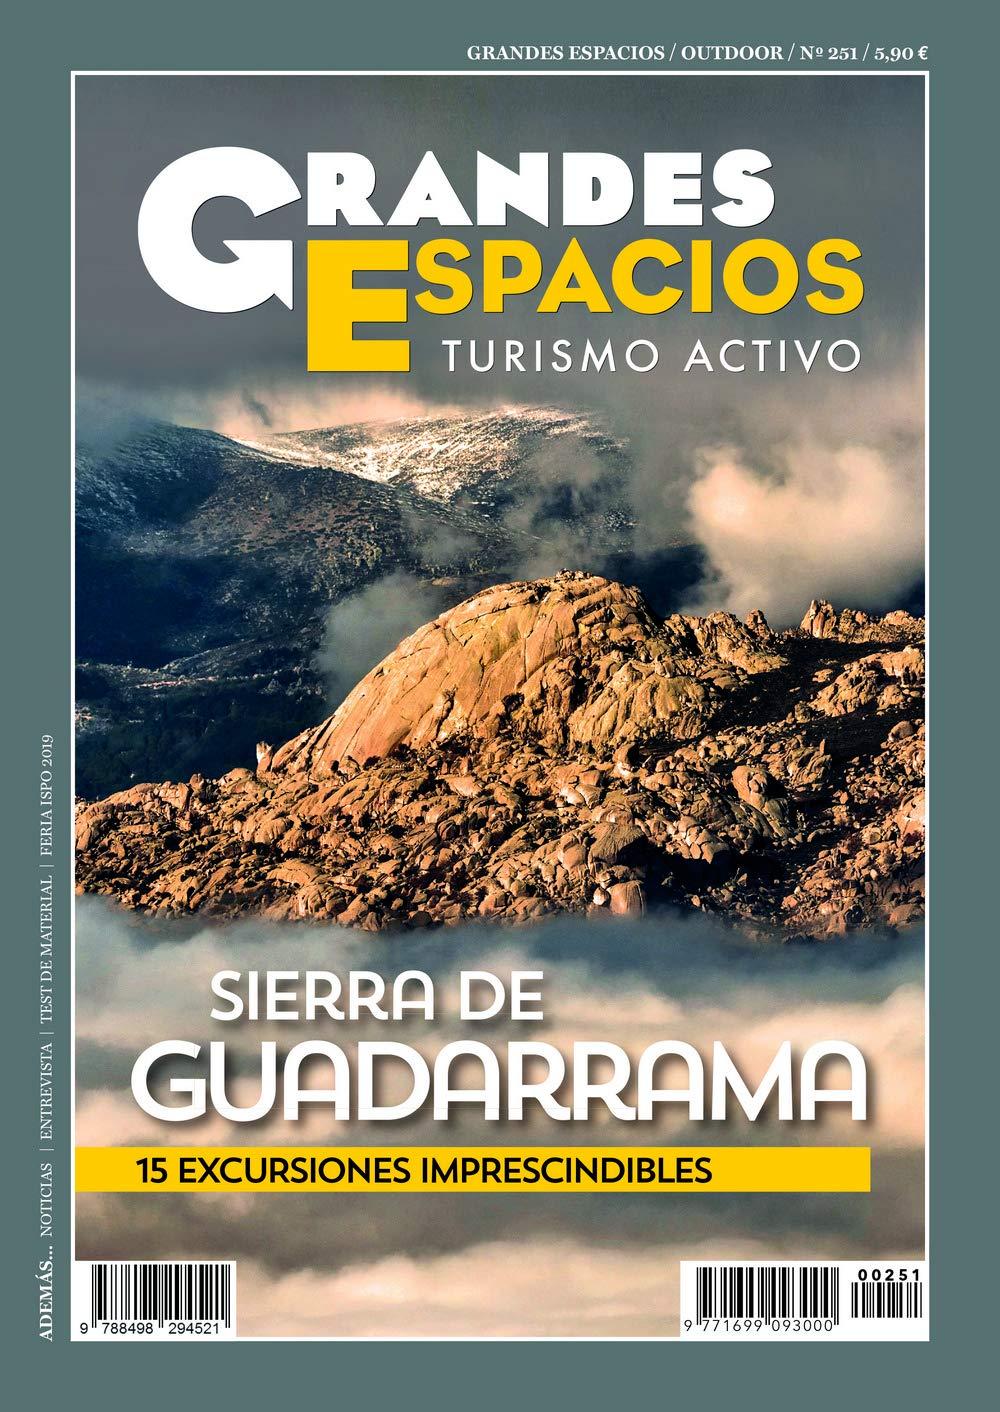 Revista Grandes Espacios 251. Guadarrama. 15 rutas imprescindibles